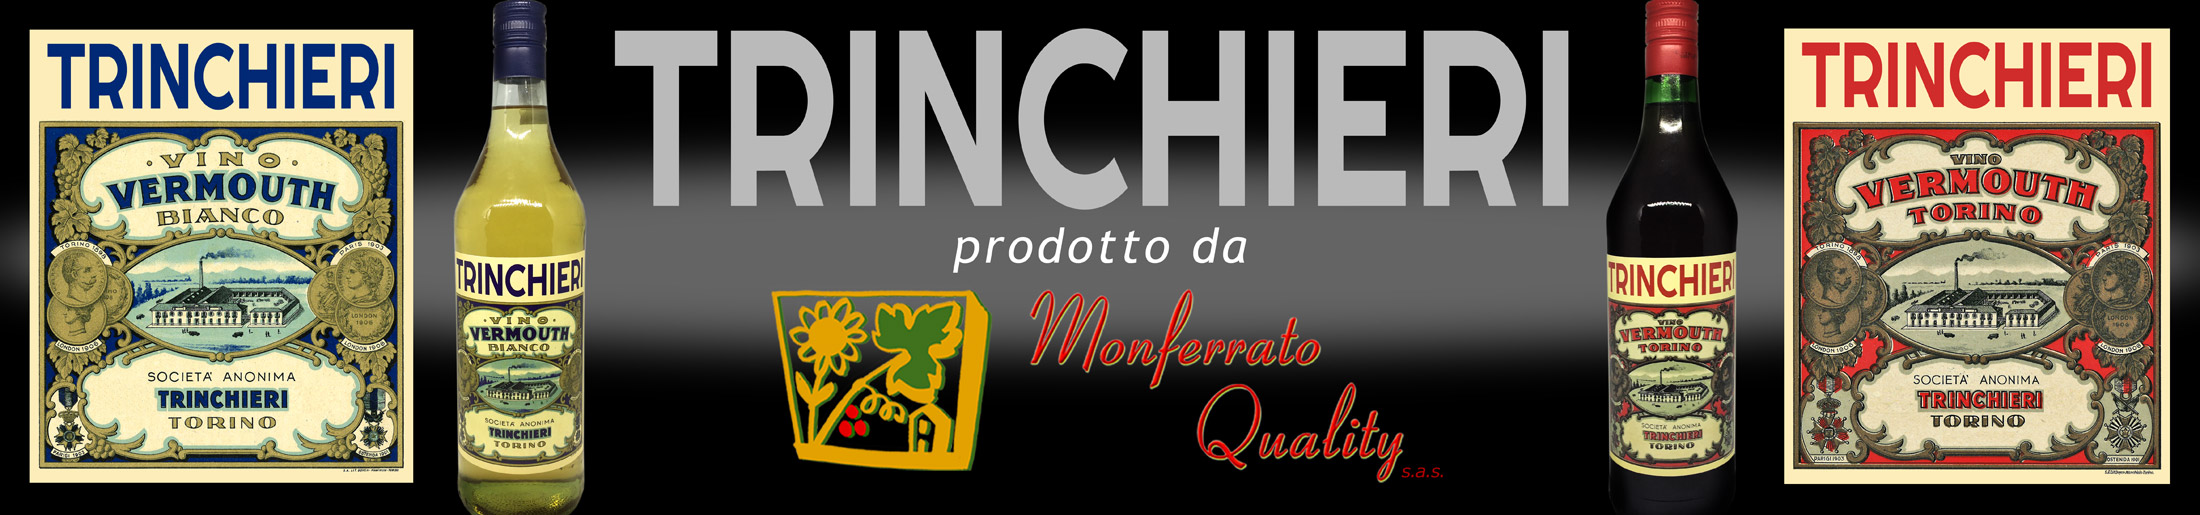 trinchieri-banner.jpg